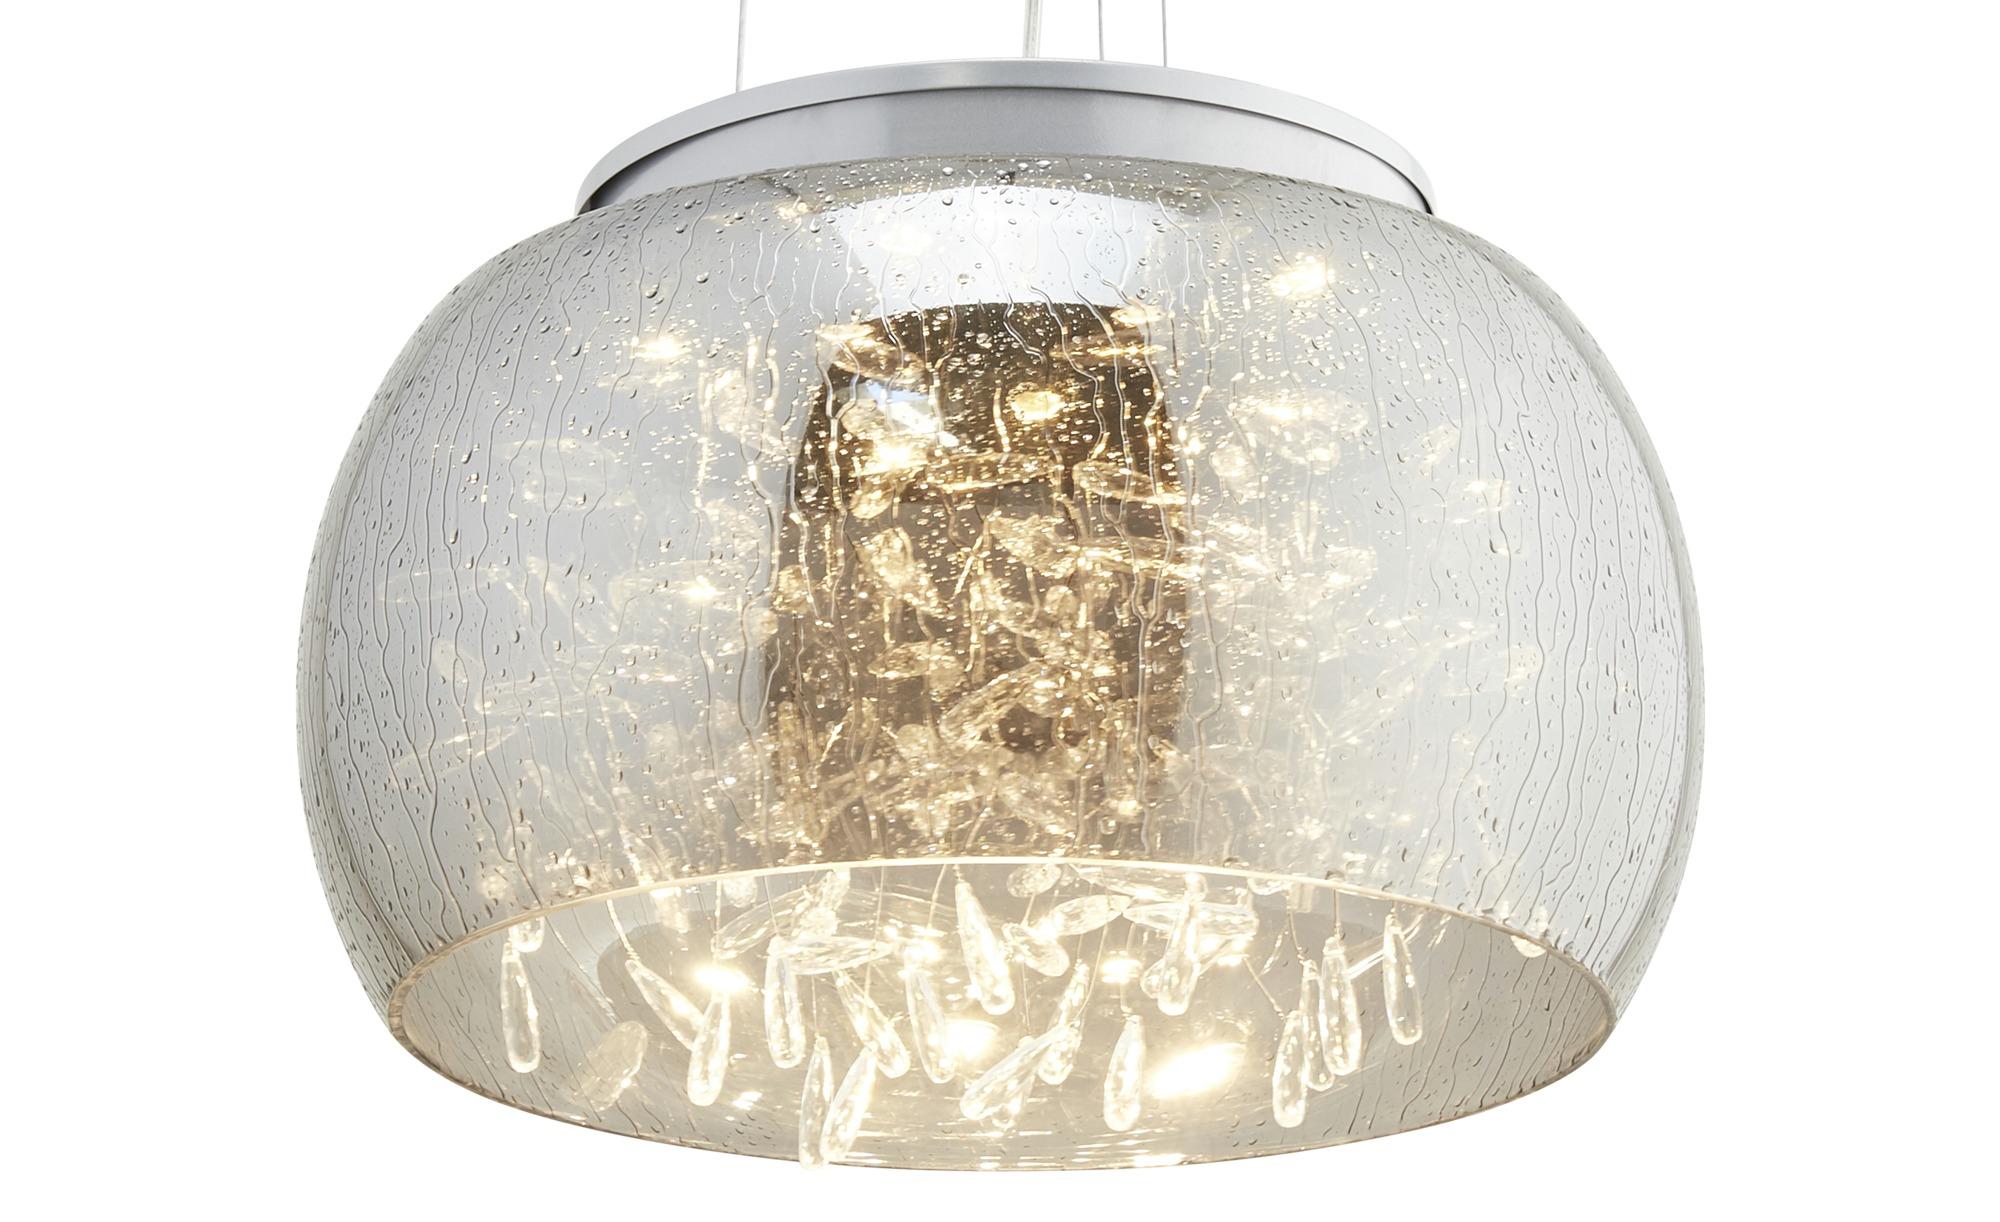 HOME STORY LED-Pendelleuchte, Rauchglas mit Acryltropfen ¦ silber ¦ Maße (cm): H: 120 Ø: [39.5] Lampen & Leuchten > LED-Leuchten > LED-Pendelleuchten - Höffner